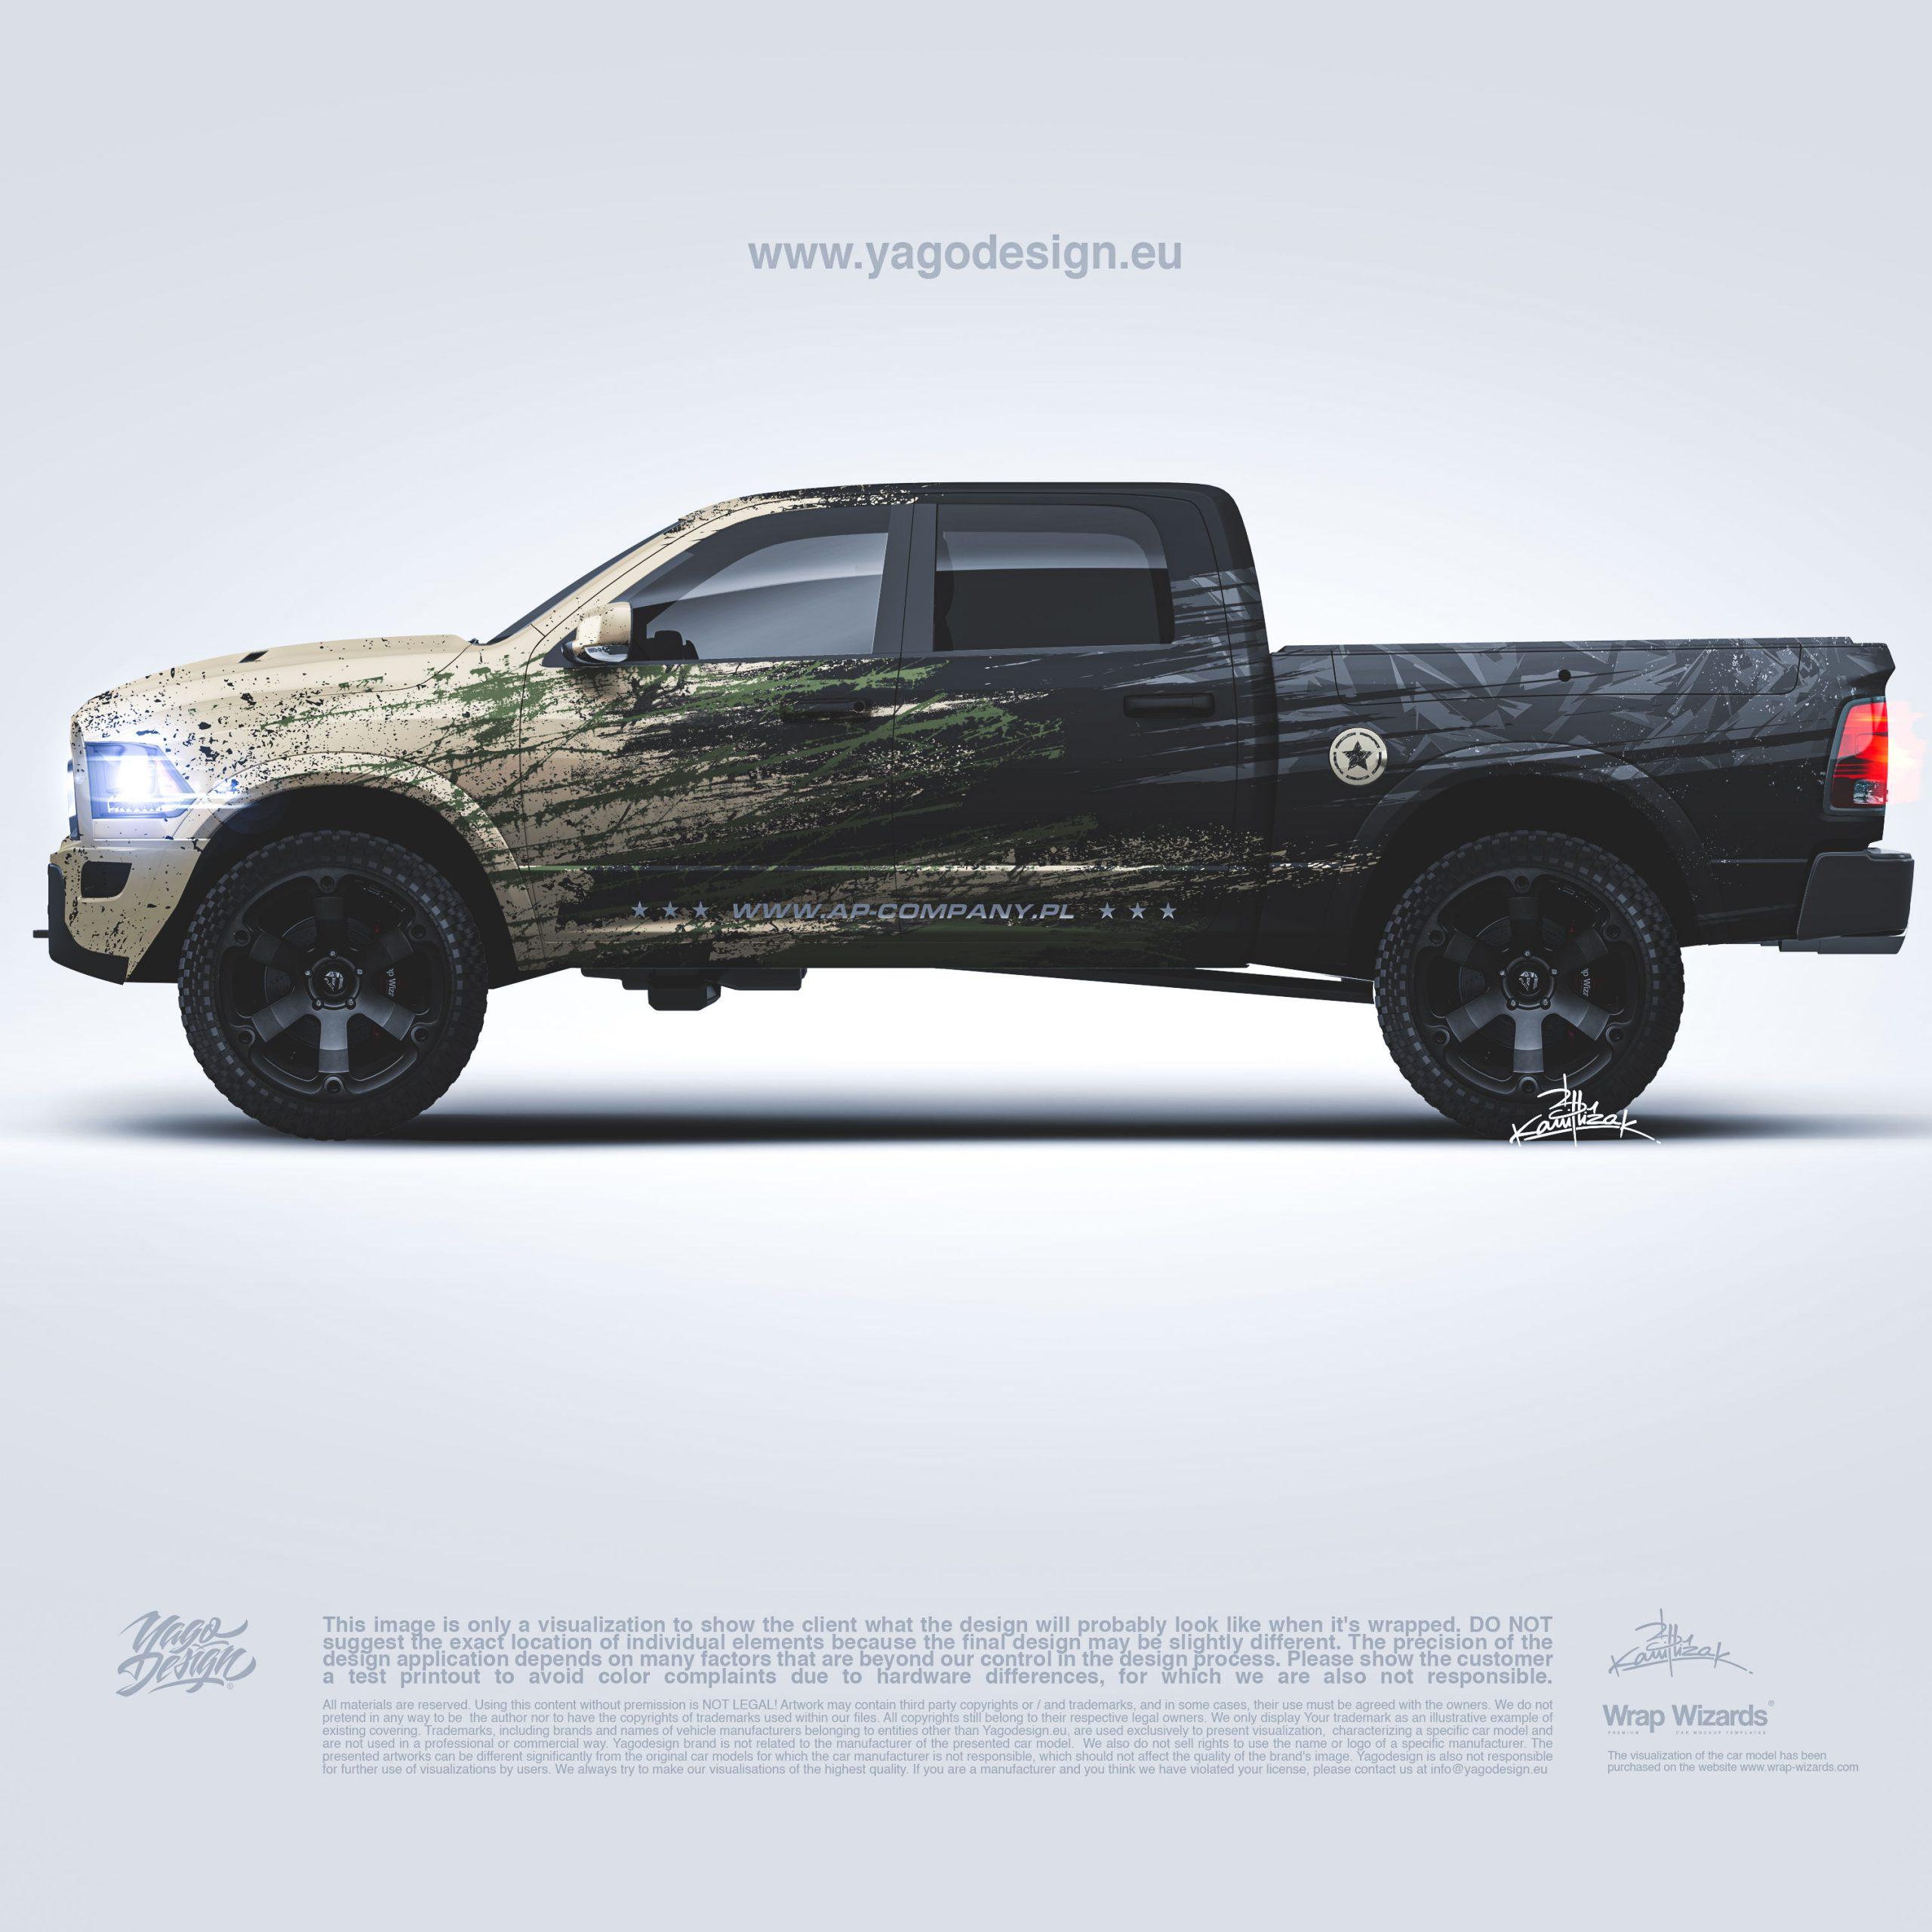 Dodge-RAM-1500-Rebel